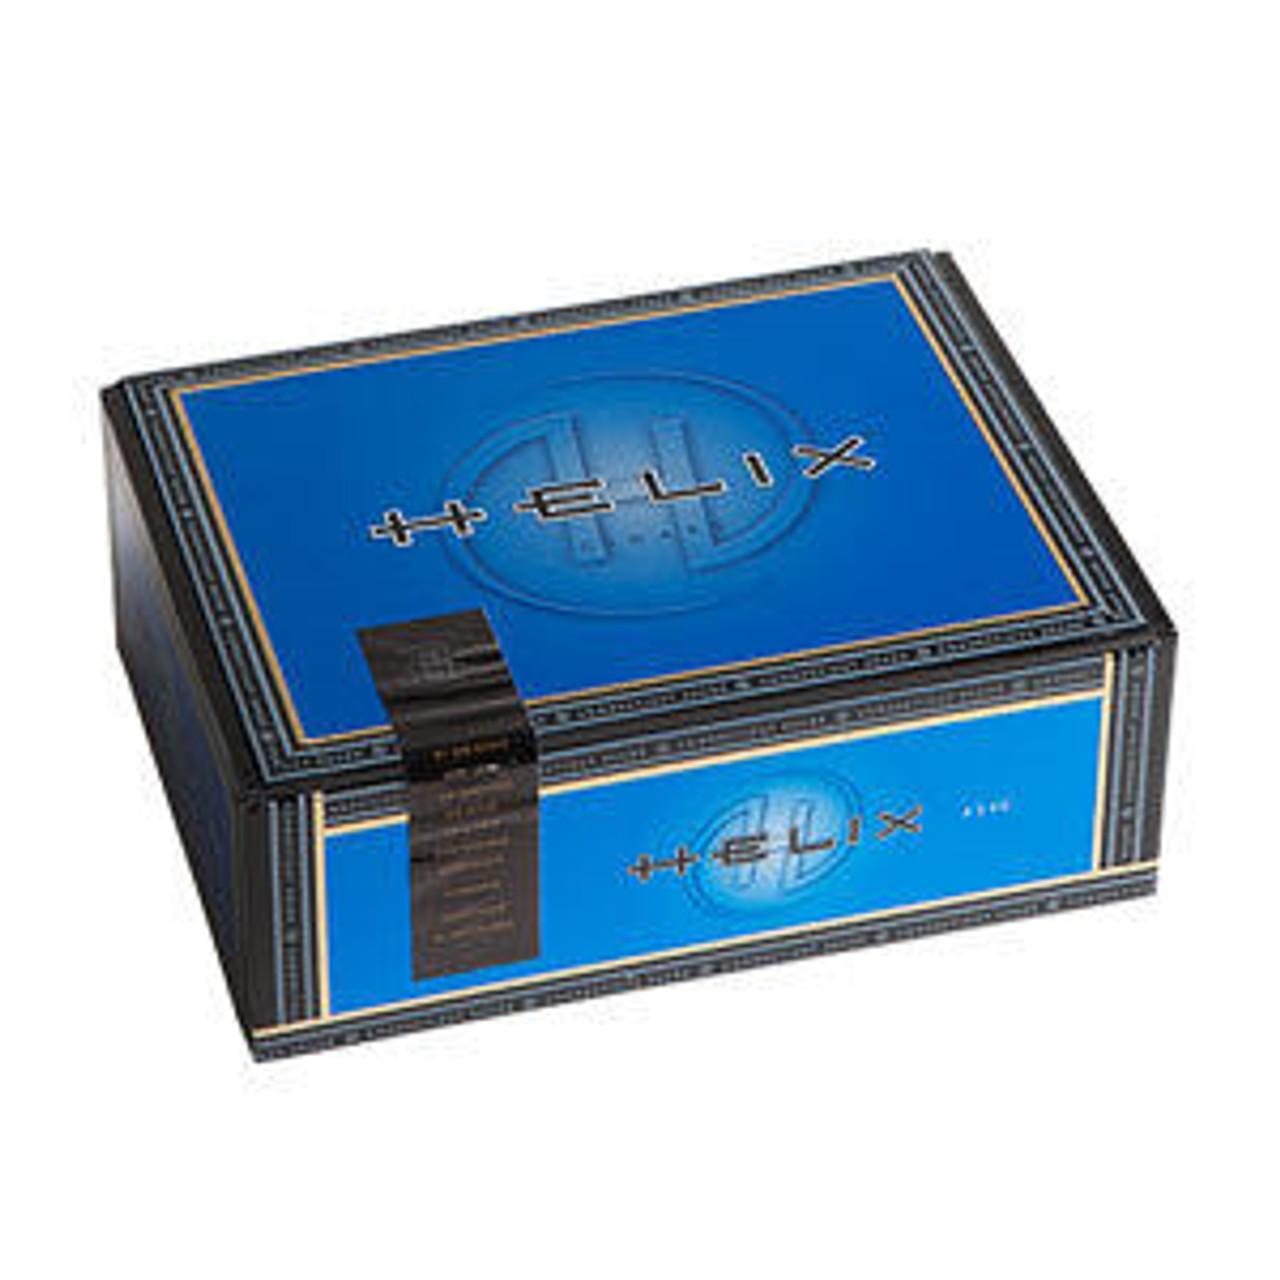 Helix X542 Cigars - 5 x 42 (Box of 25)